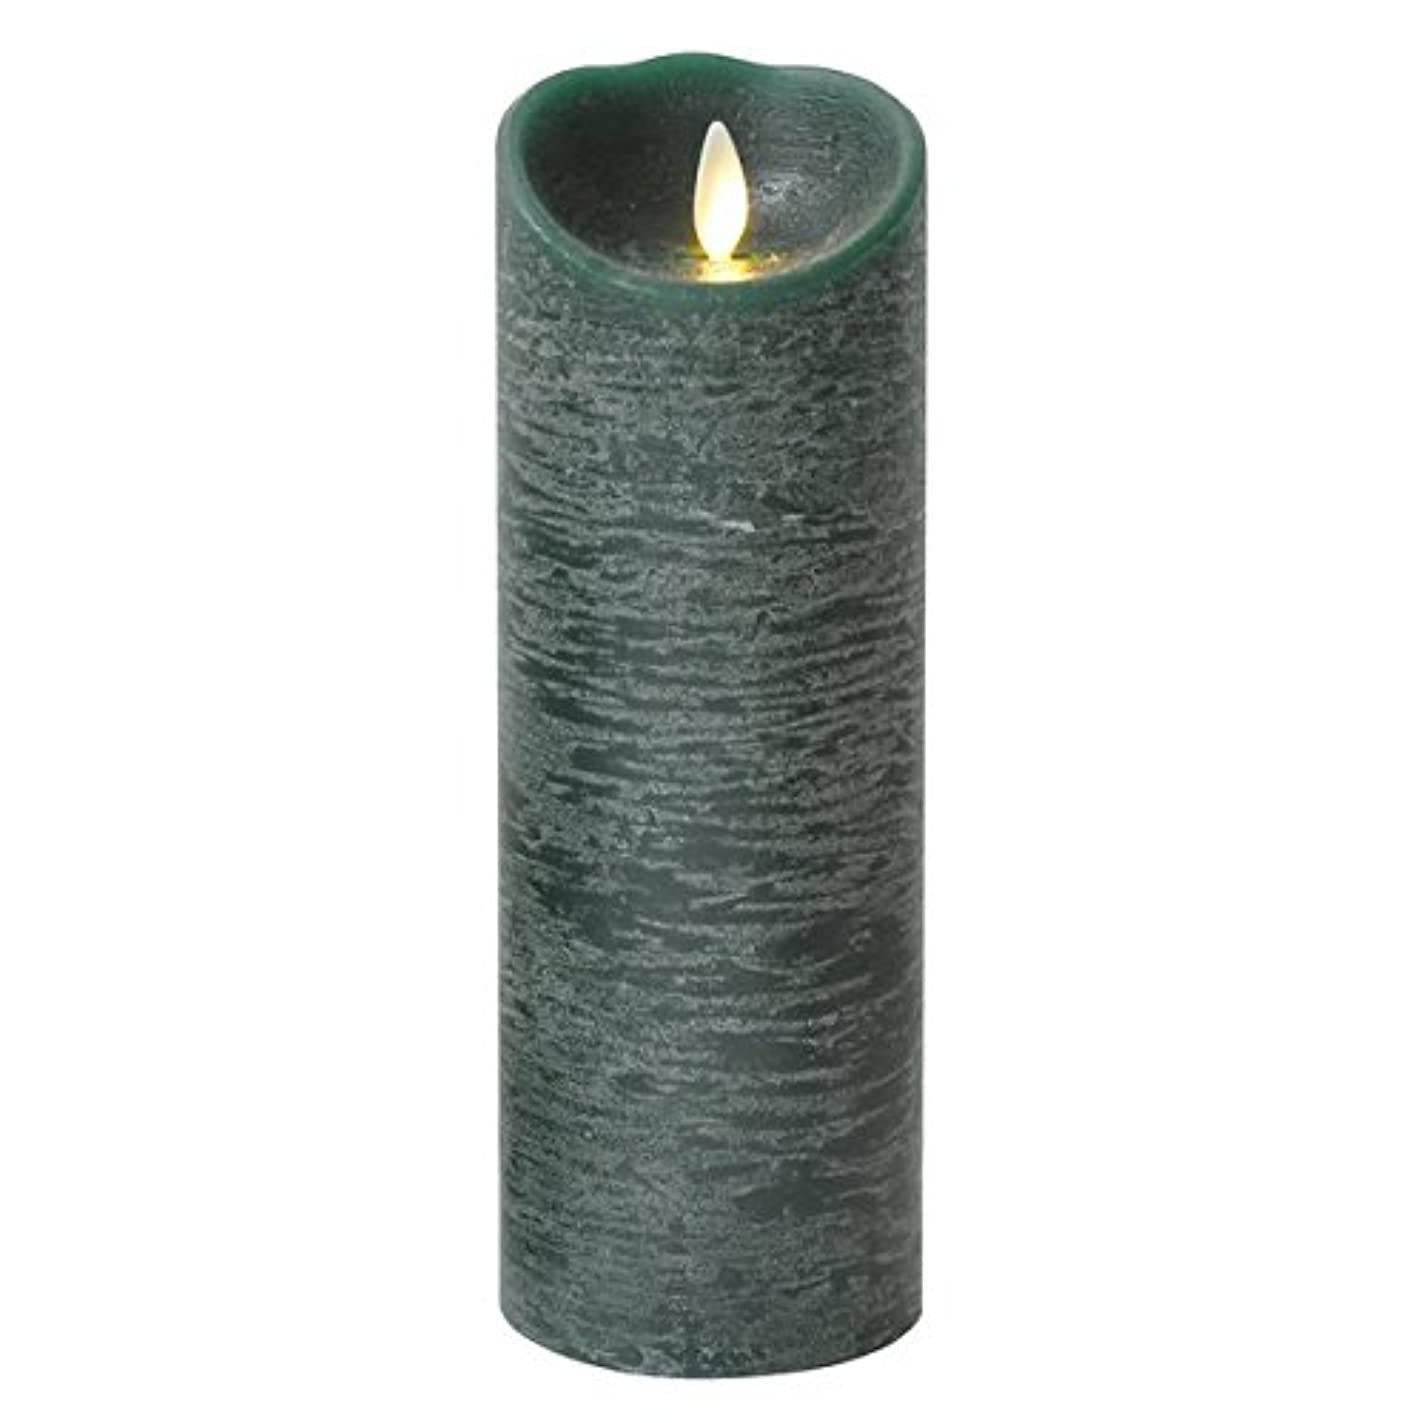 LUMINARA L グリーン LM402-GR 生活用品 インテリア 雑貨 アロマ 芳香剤 消臭剤 その他のアロマ top1-ds-1213221-ah刻印 [簡素パッケージ品]